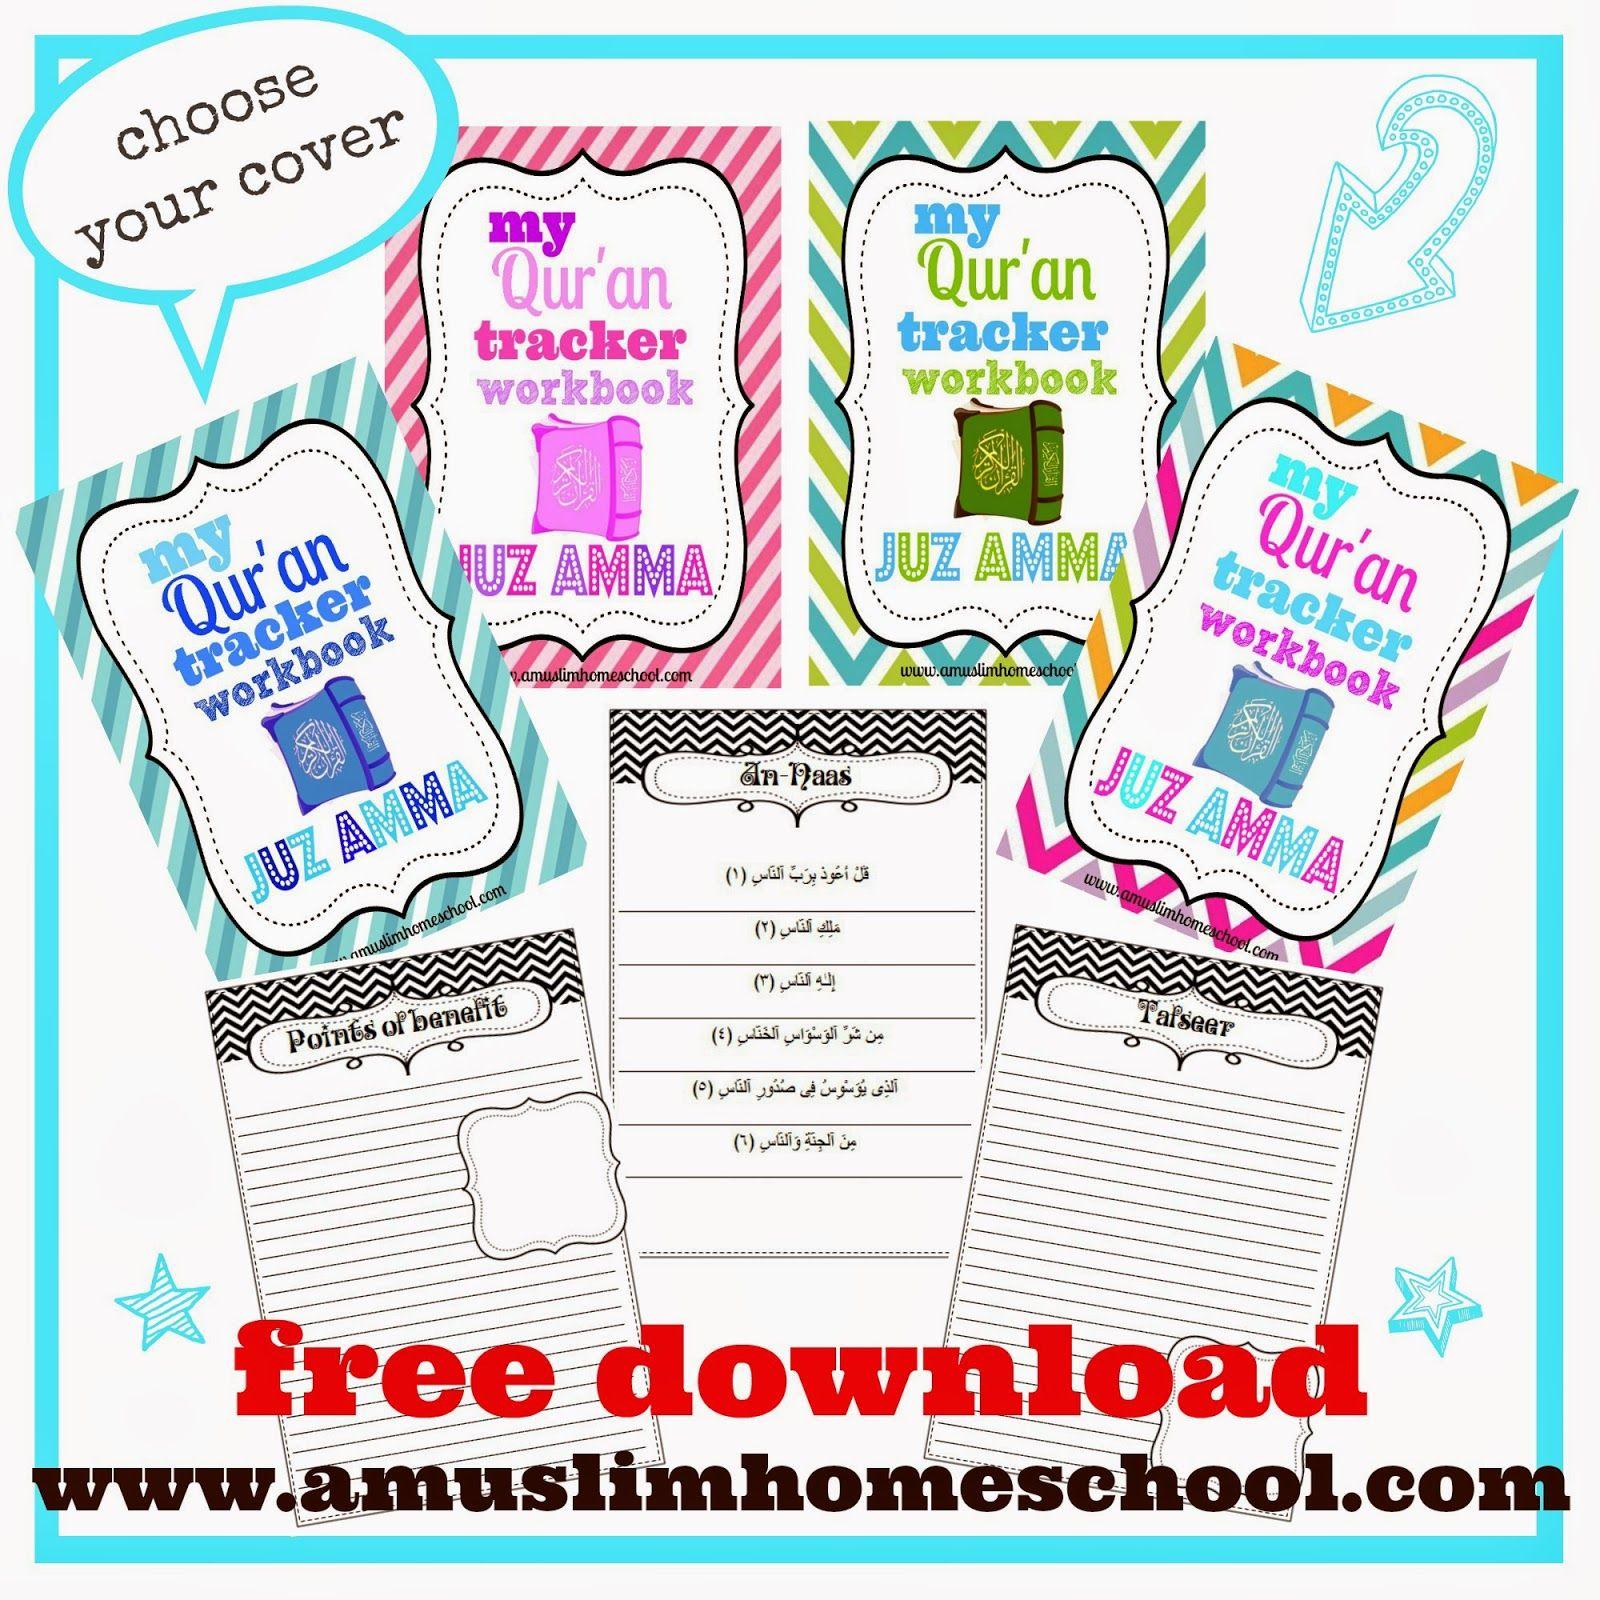 Print At Home Your Own Juz Amma Workbook